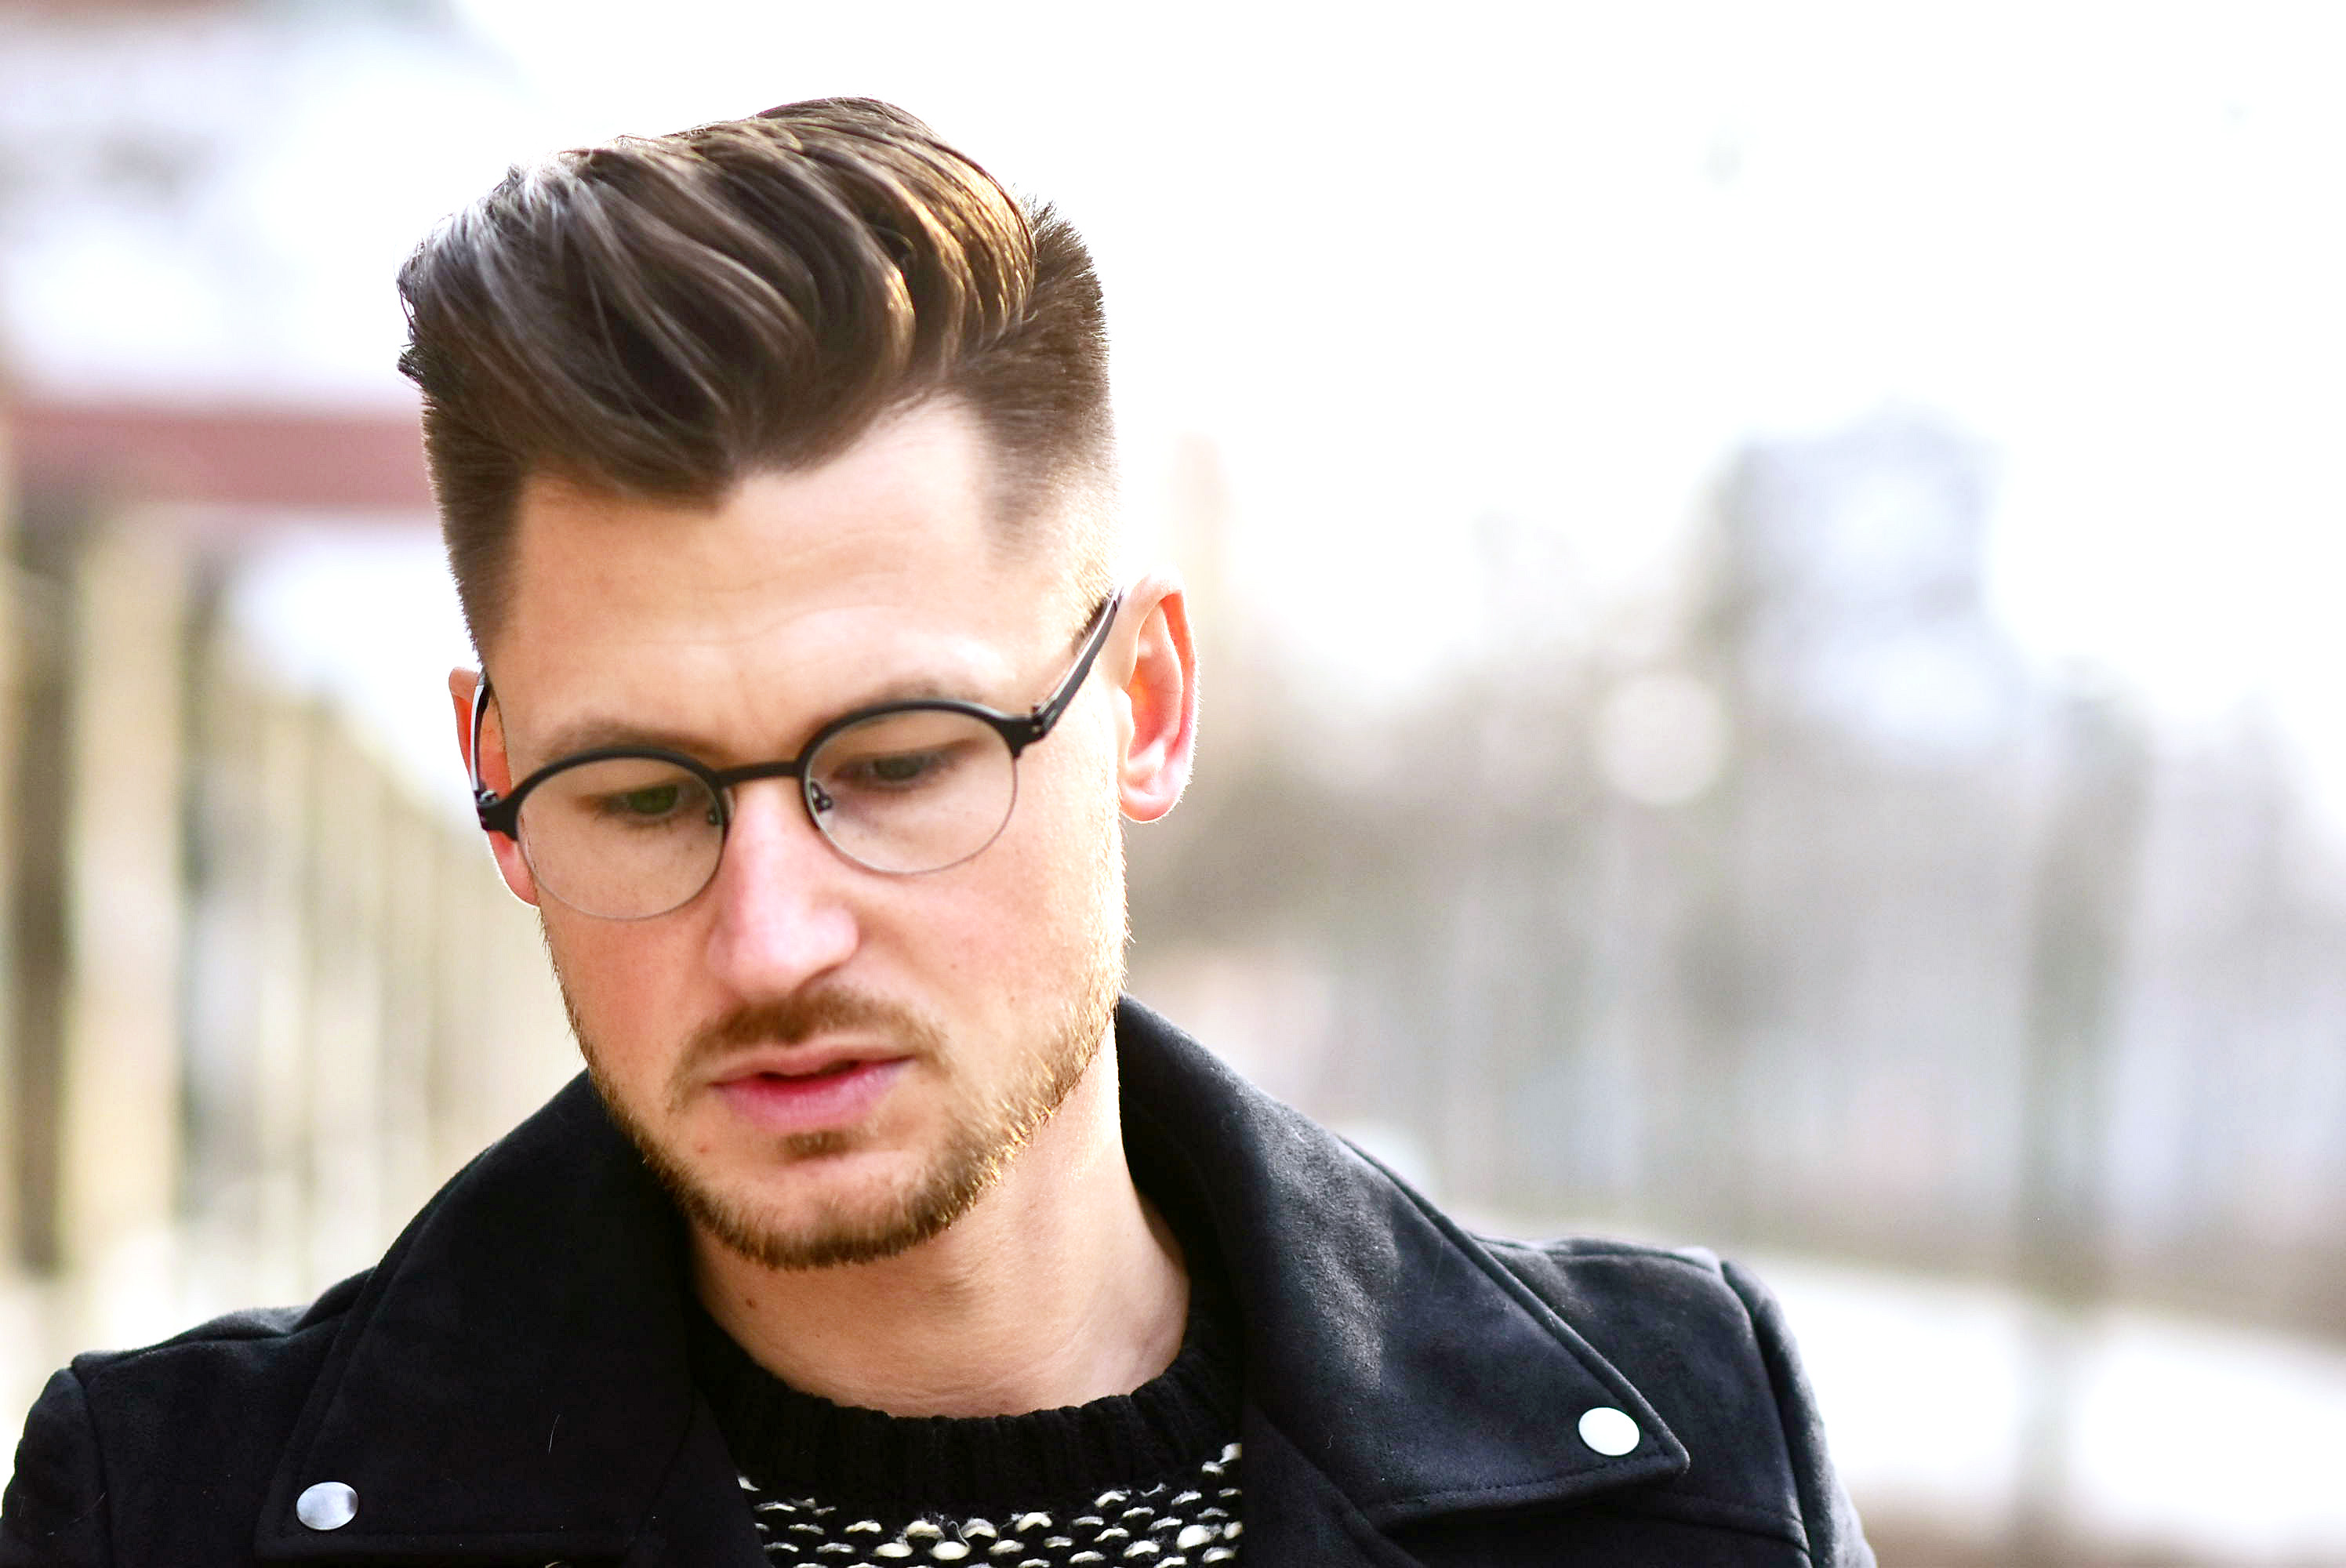 Tommeezjerry-Styleblog-Männerblog-Modeblog-Berlin-Outfit-Accessoire-Brille-Glasses-Model-YUN-Eyewear